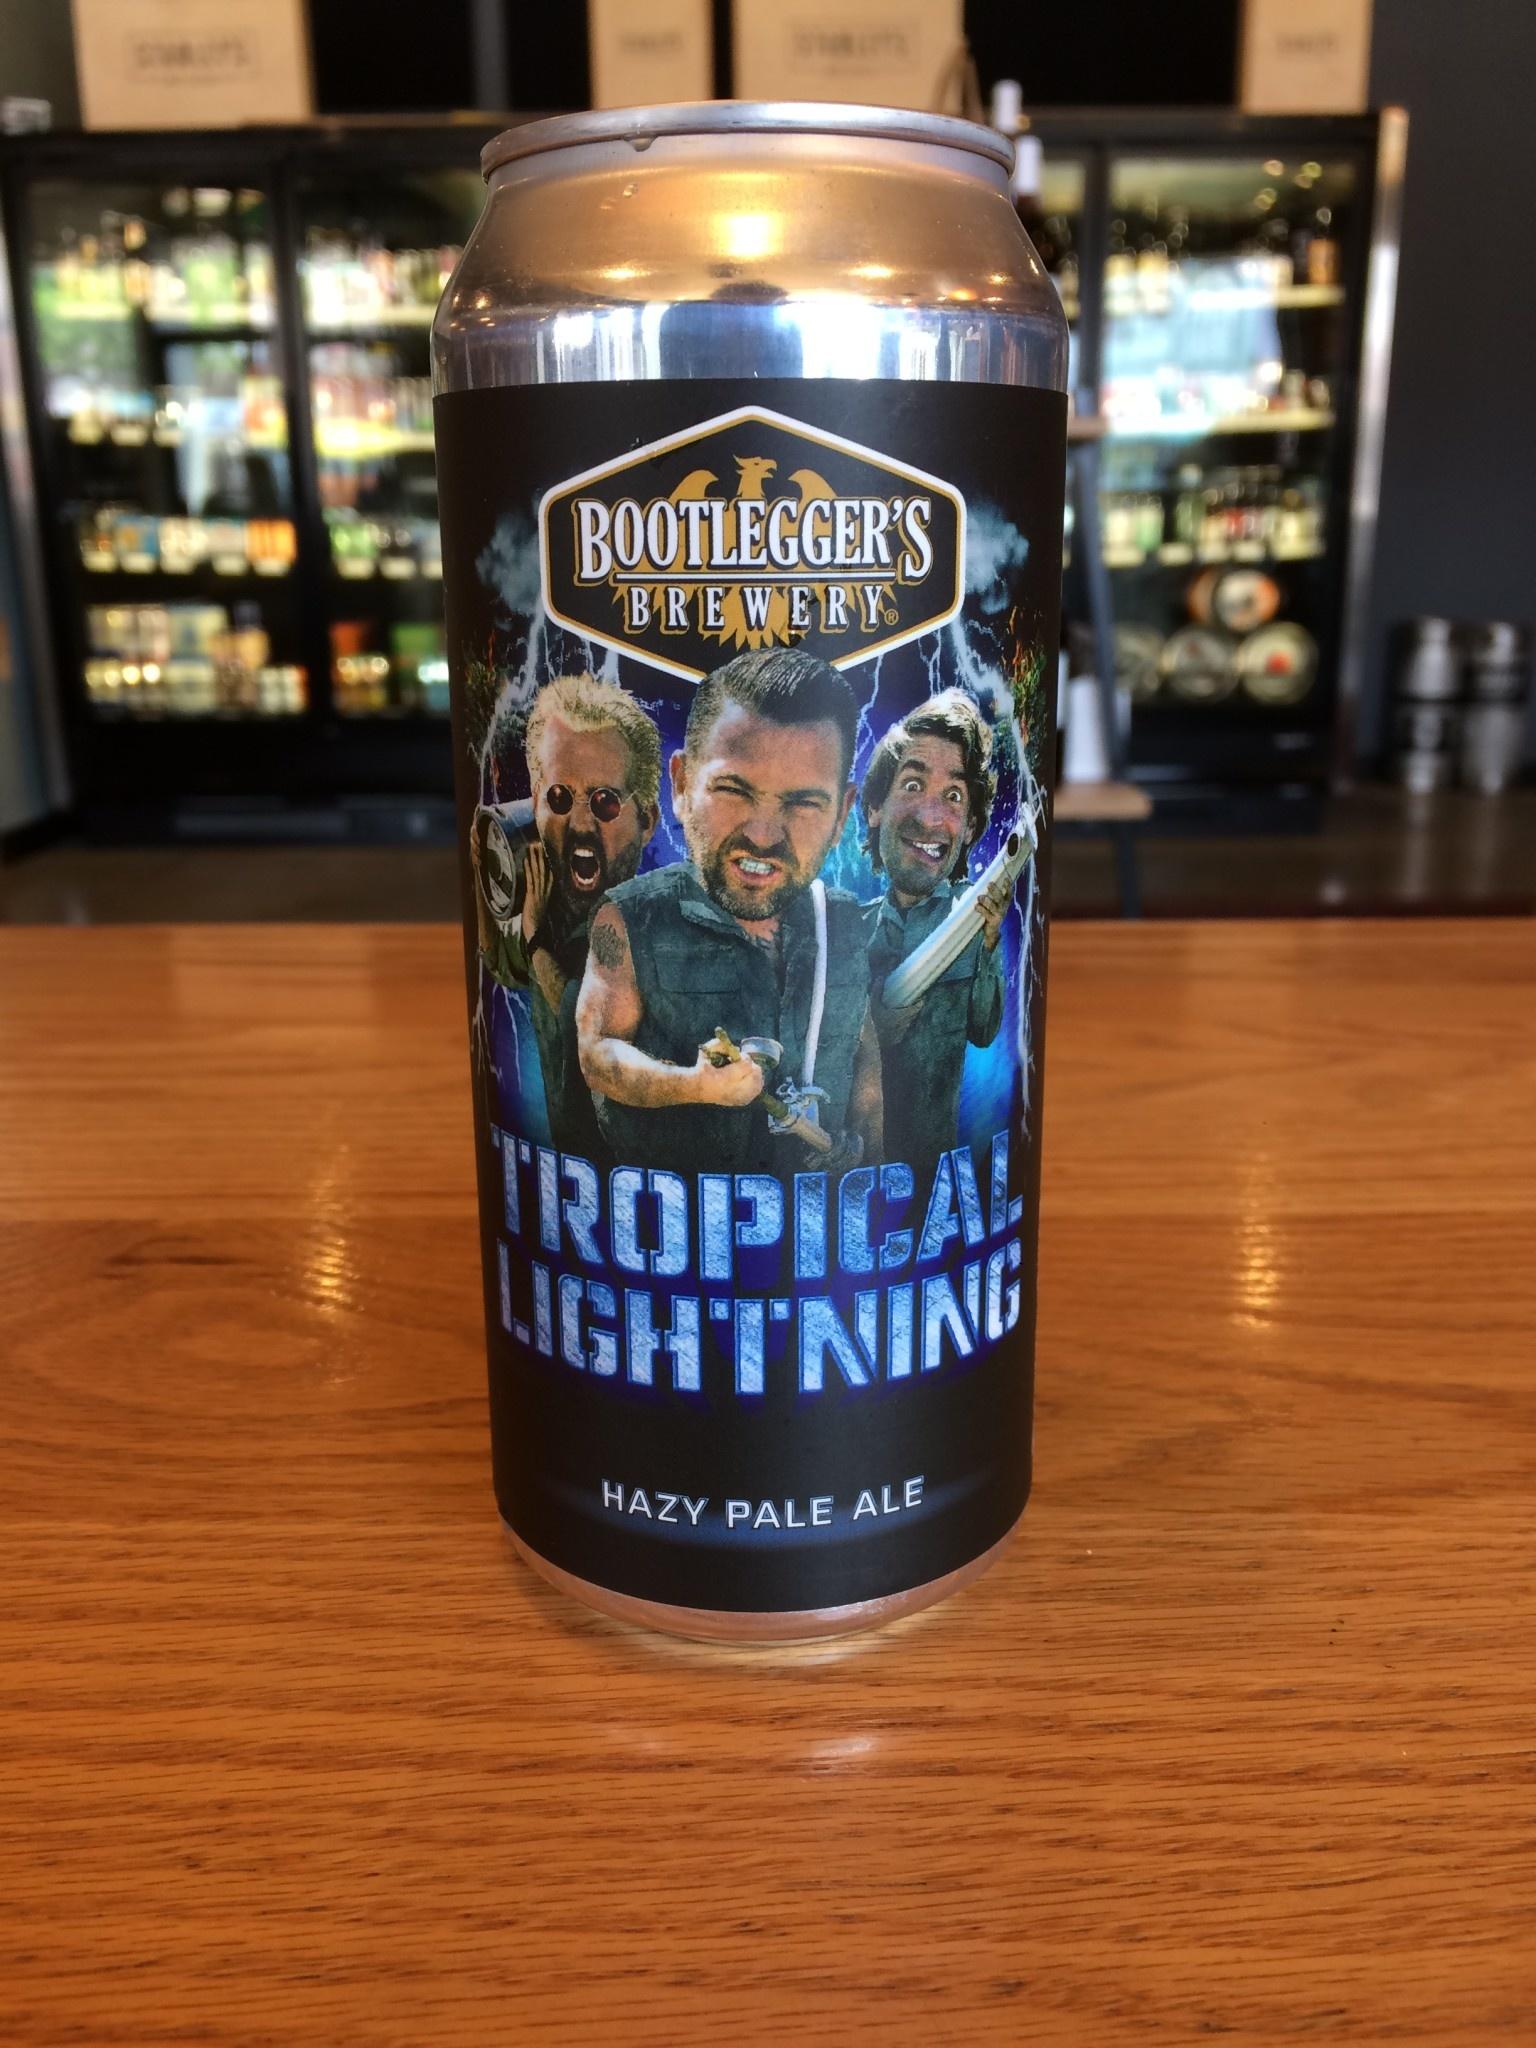 Bootlegger's Brewery Bootlegger's Brewery Tropical Lightning 16oz